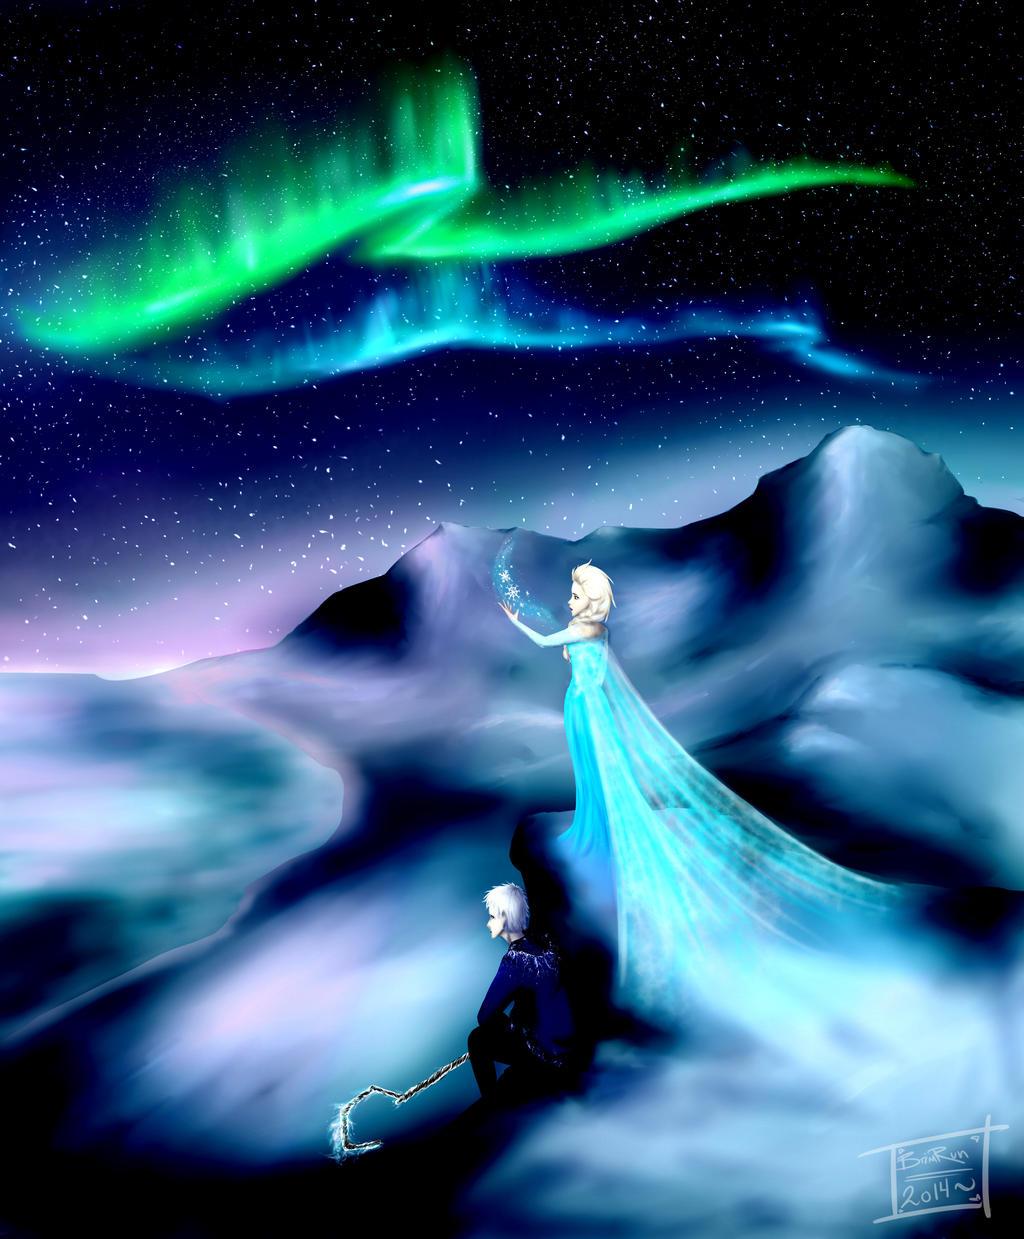 Night light x jack frost -  Frozen The Northern Lights By Brimrun